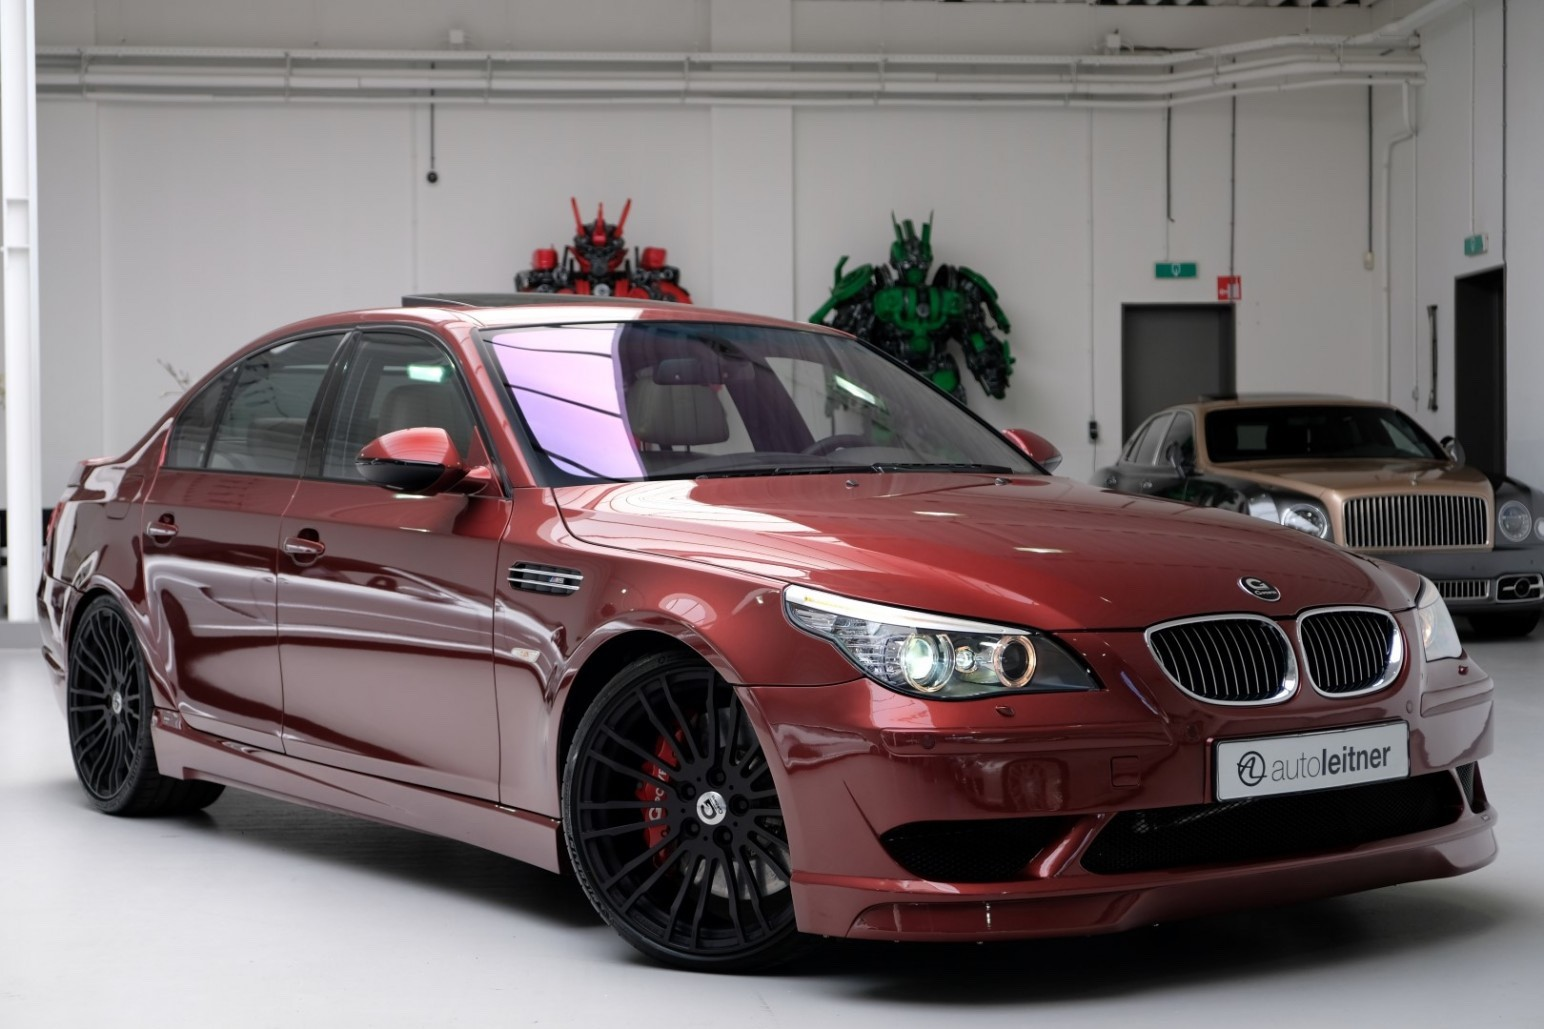 BMW_M5_Hurricane_RS_G-Power_0010